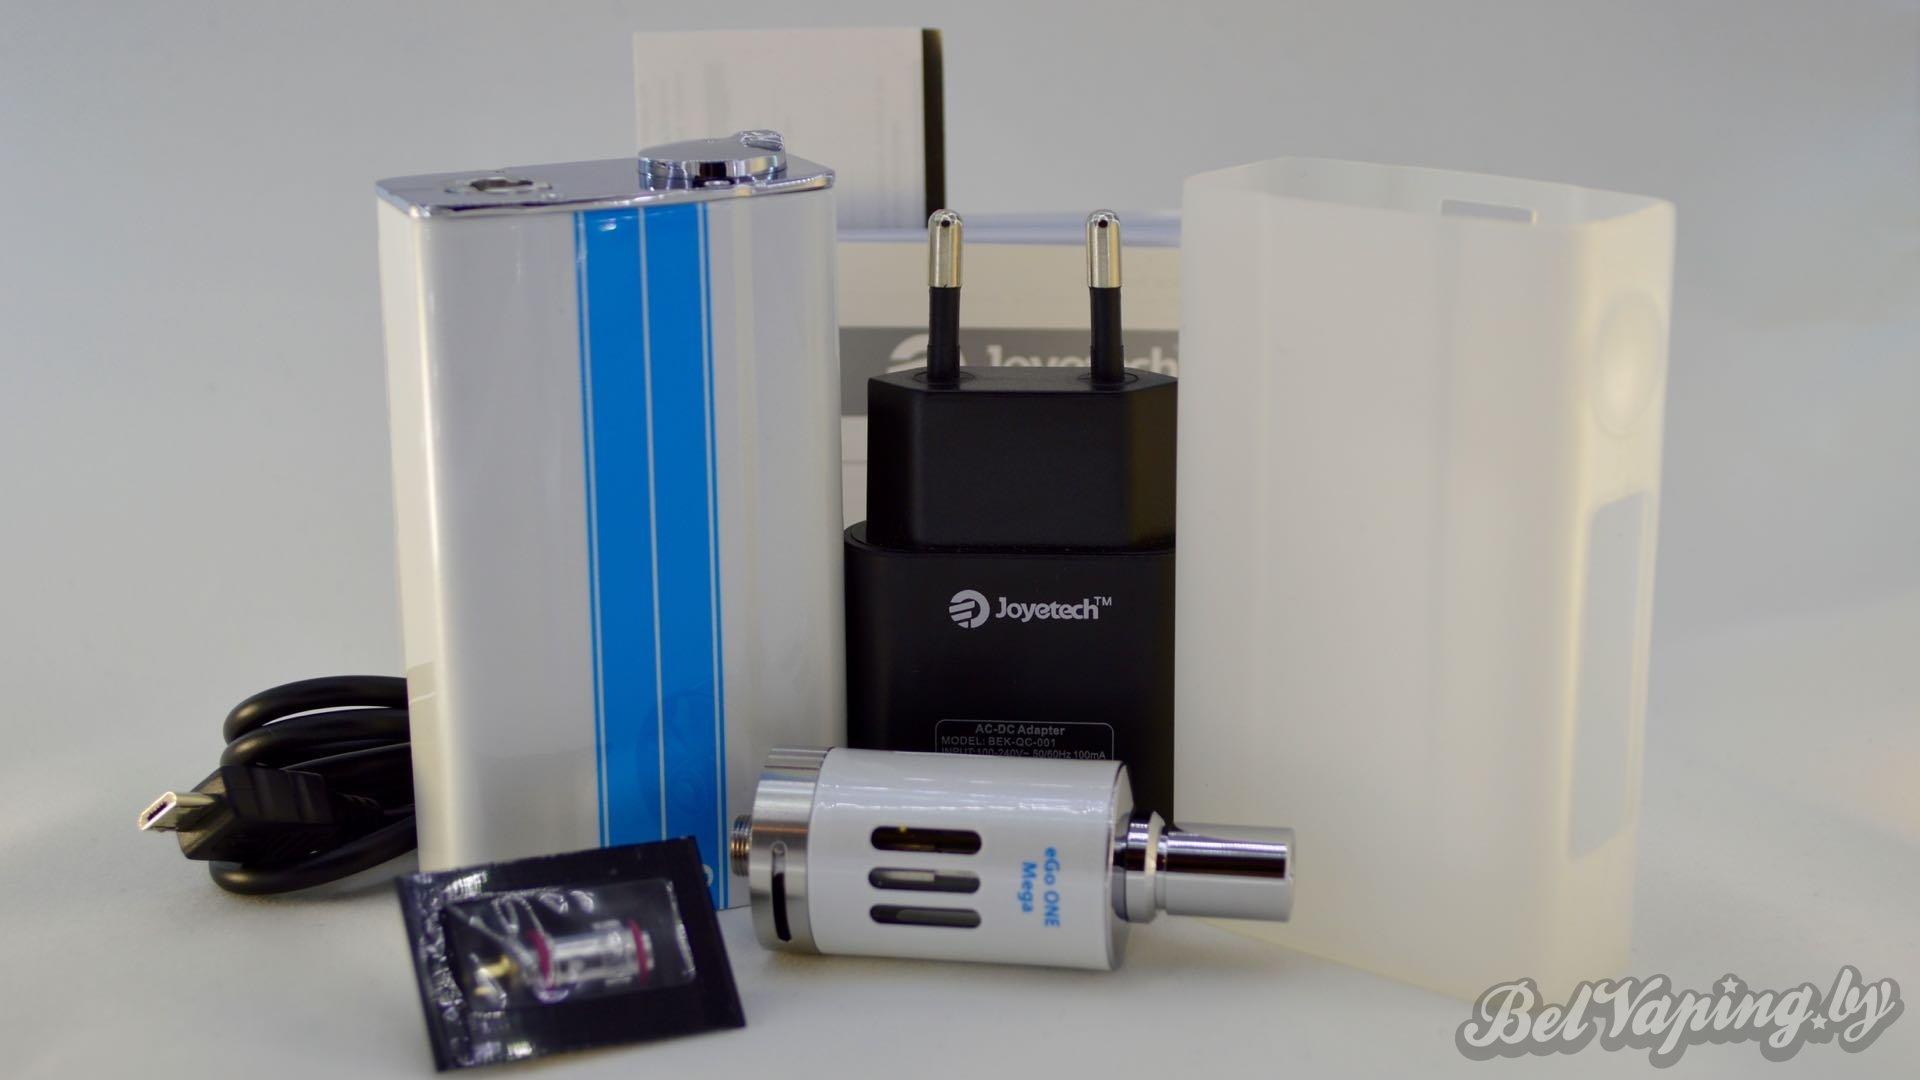 Обзор набора от Joyetech - evic-VT Kit. Комплект поставки.